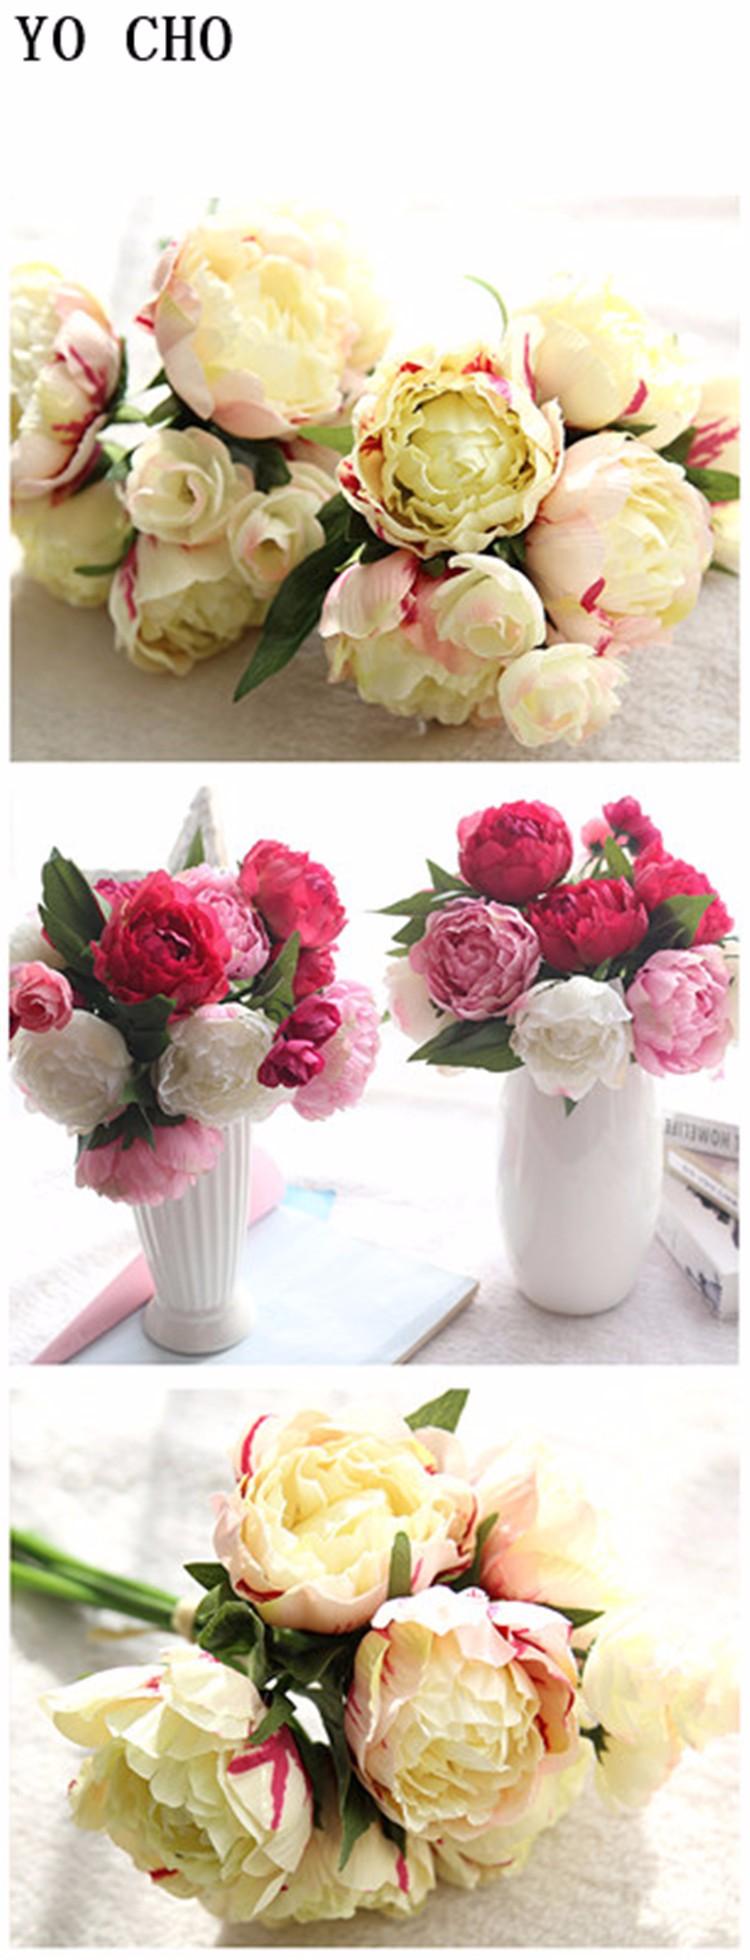 Yo Cho Import China Fabric Artificial Flower Wall Decoration Laux